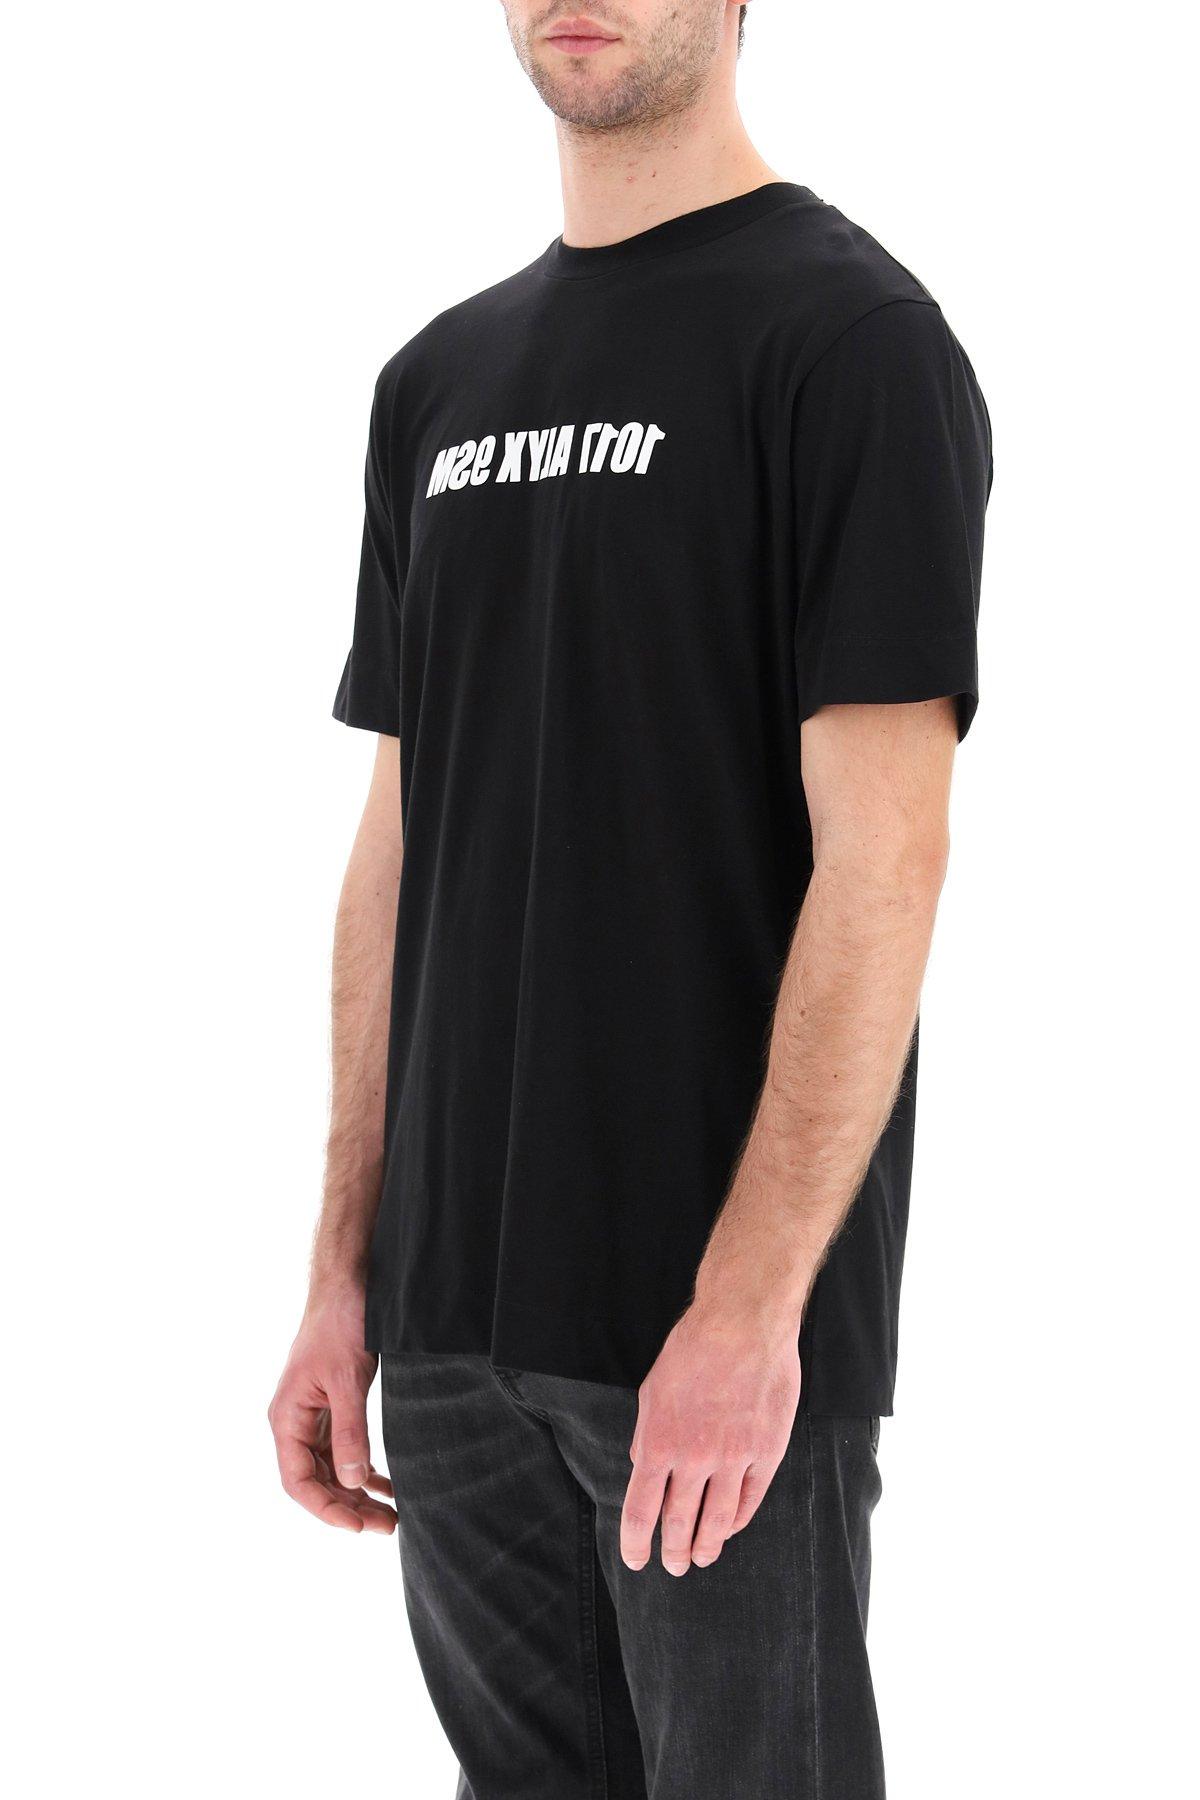 1017 alyx 9sm t-shirt con logo mirrored